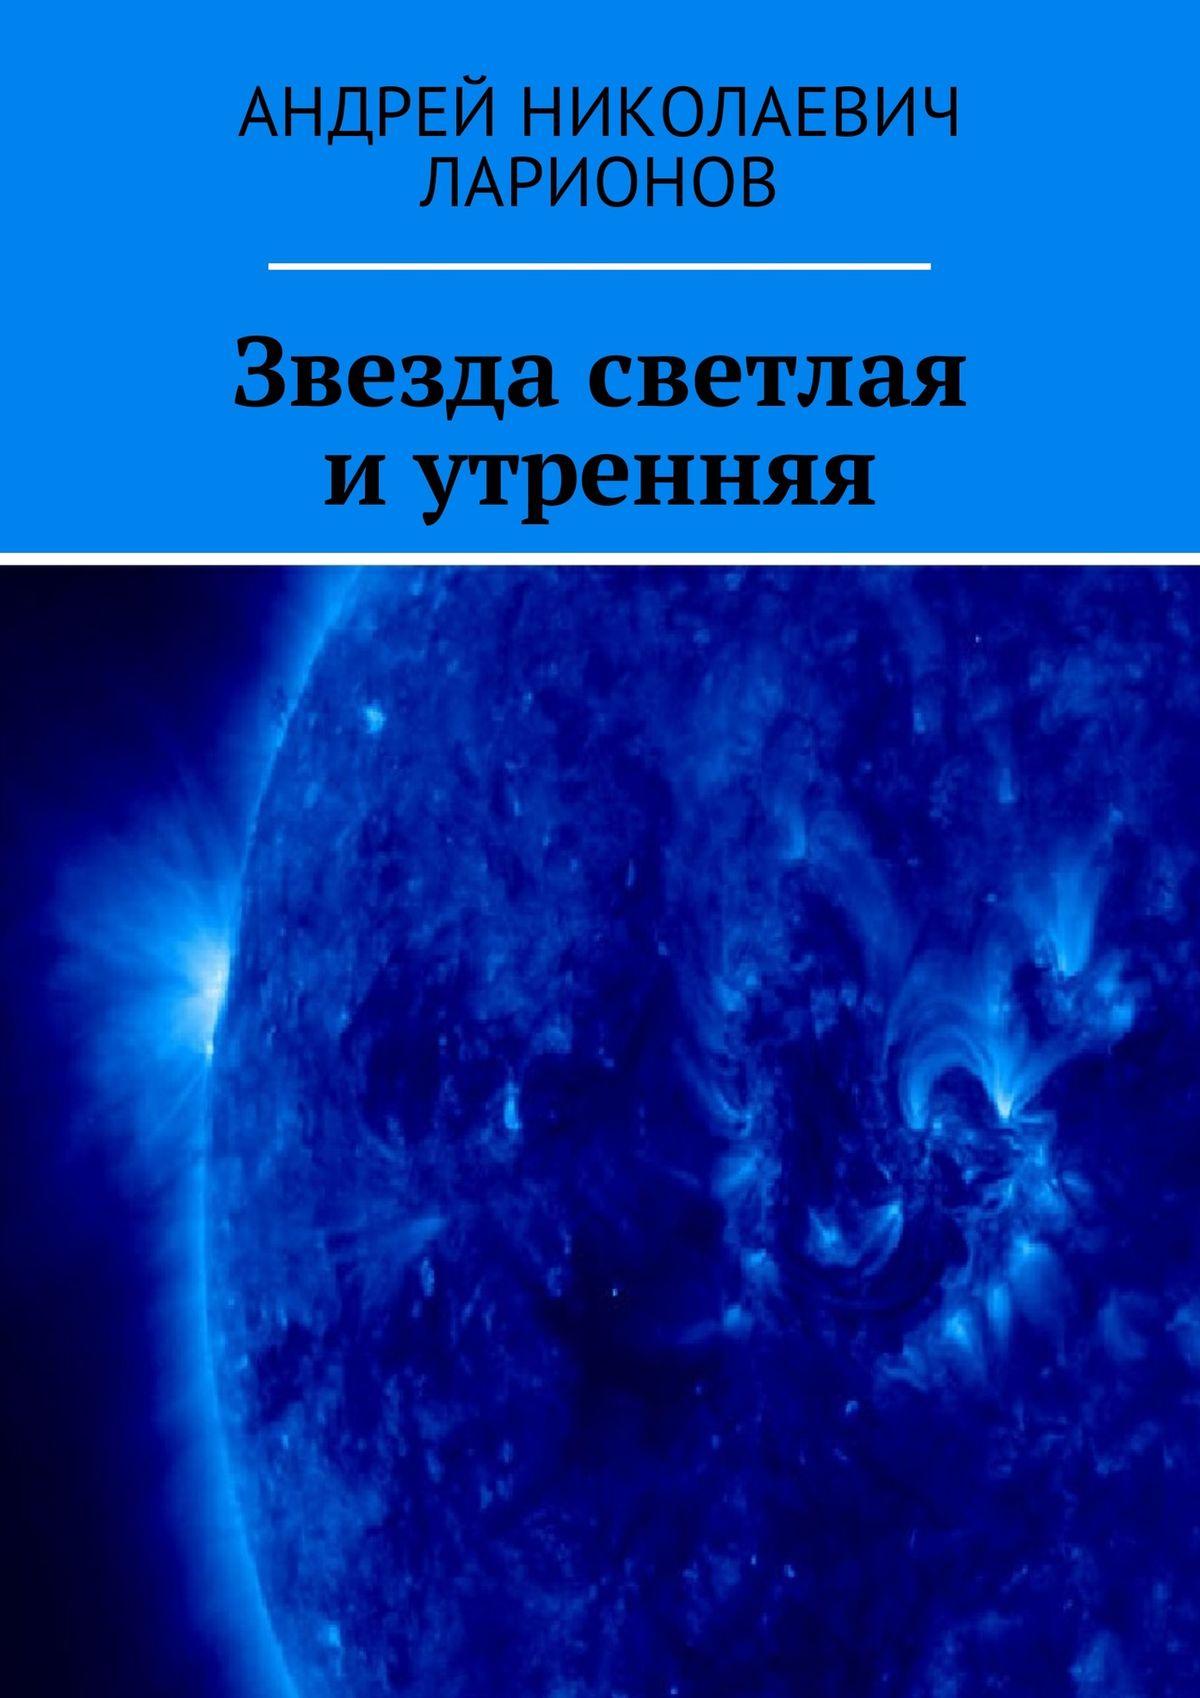 Андрей Николаевич Ларионов Звезда светлая иутренняя набор чистая кожа steblanc набор чистая кожа